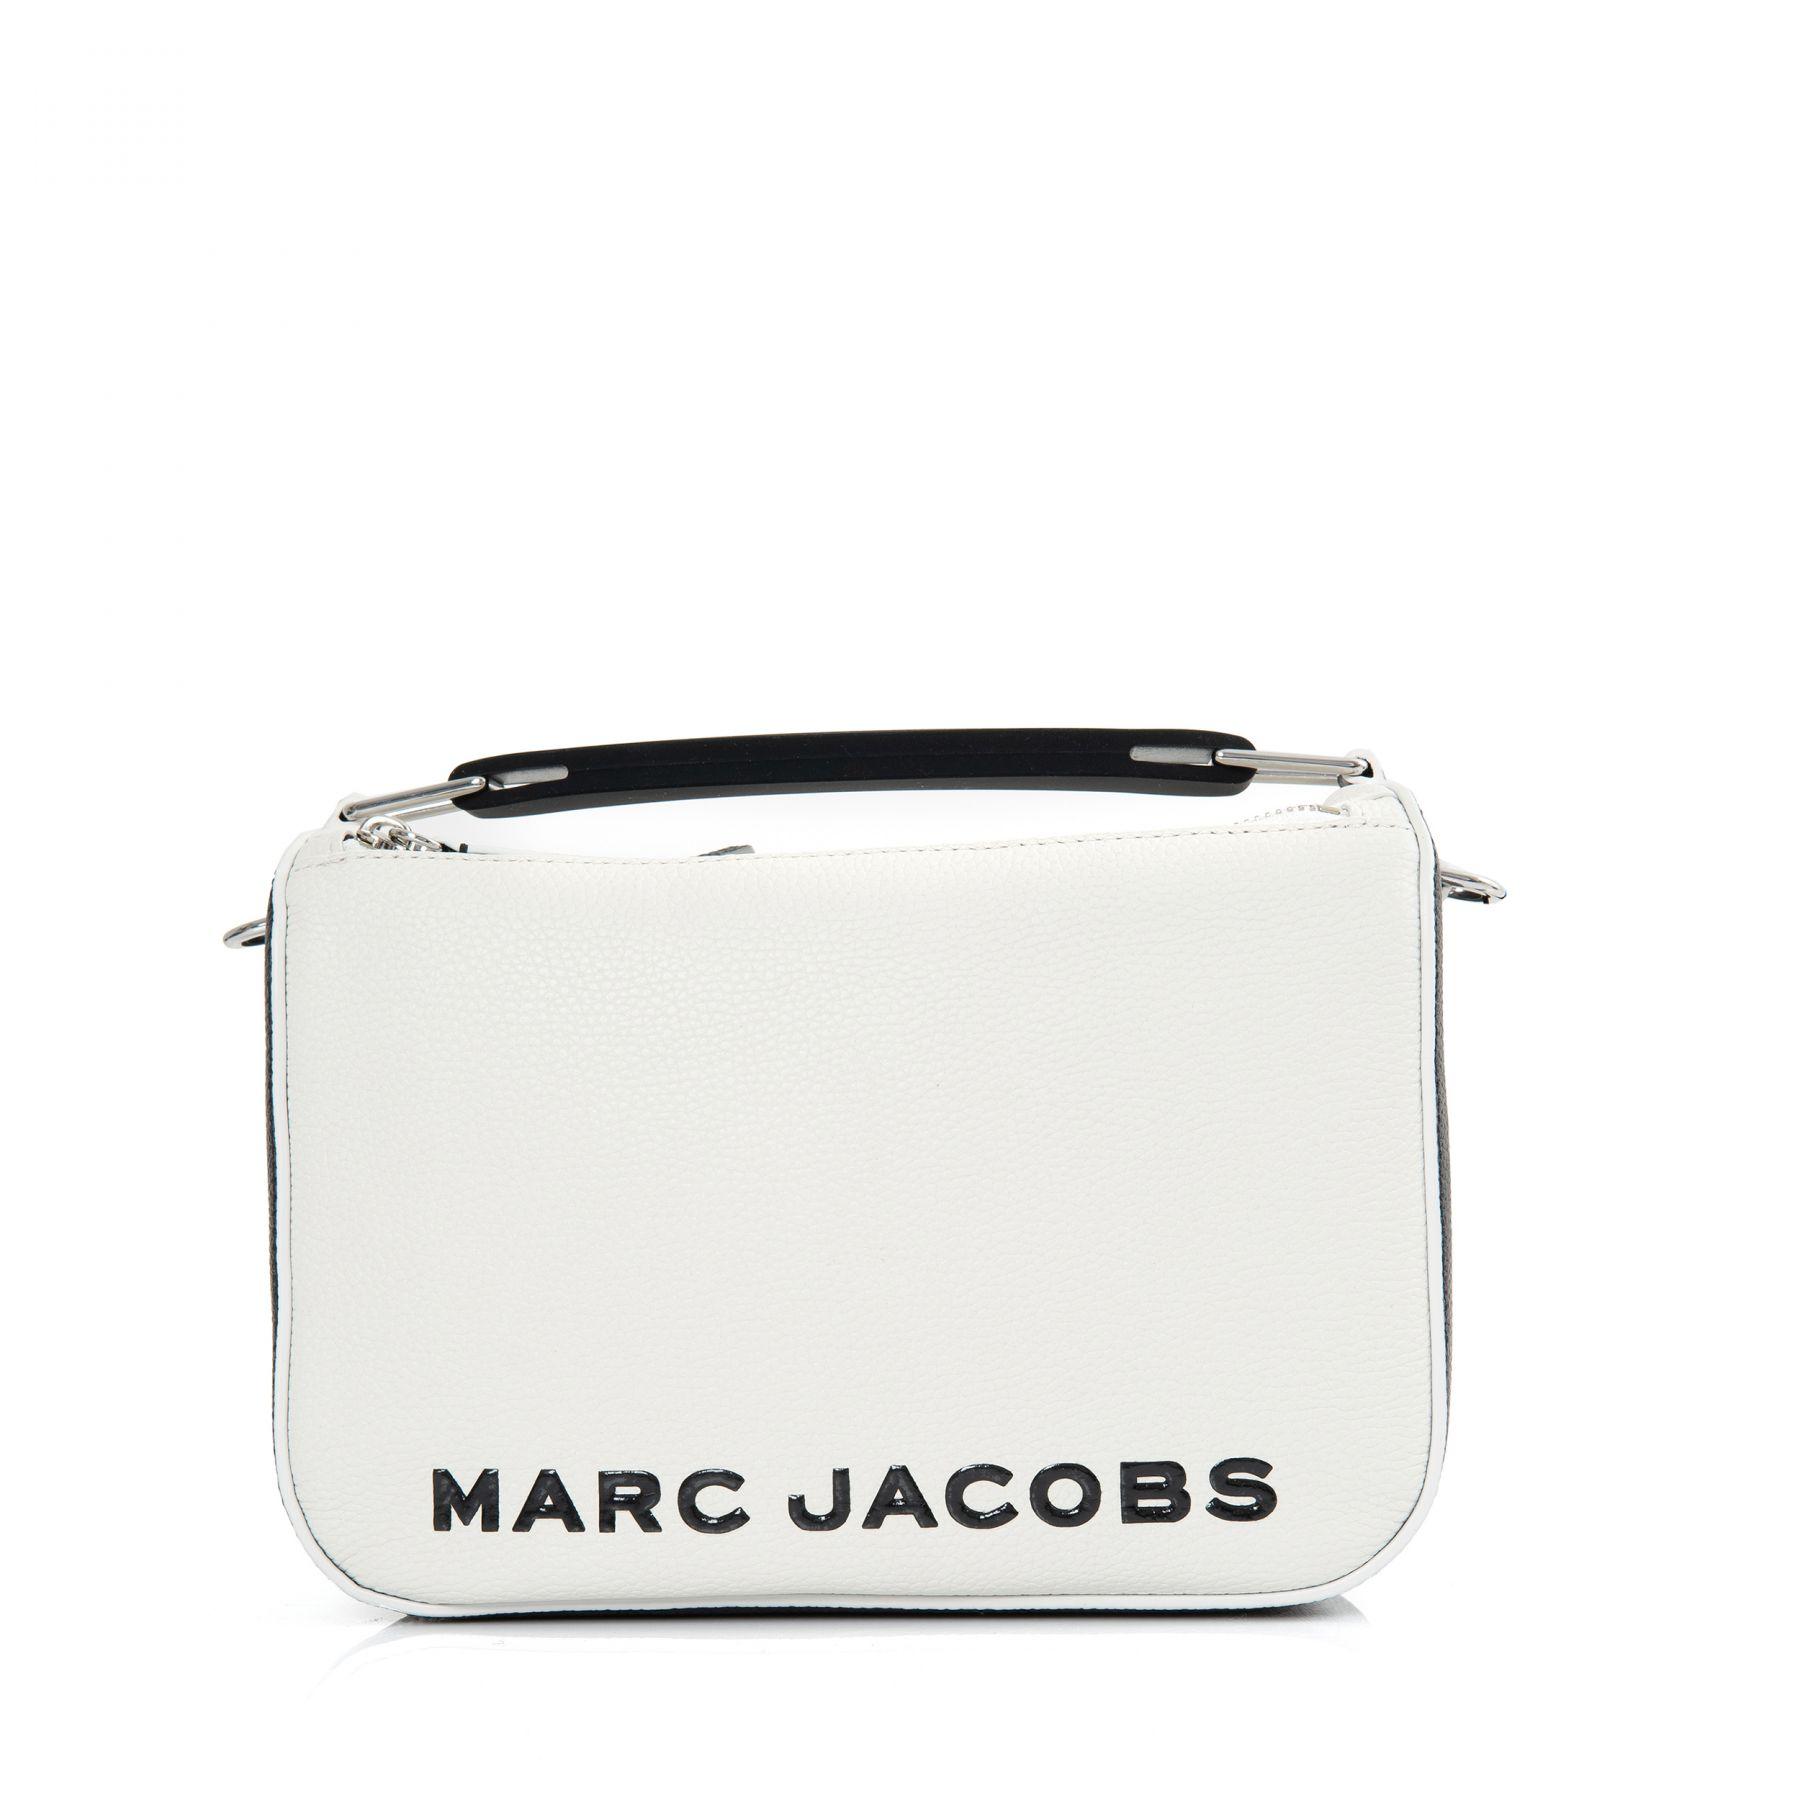 Сумка Marc Jacobs THE COLORBLOCK SOFTBOX бело-черная